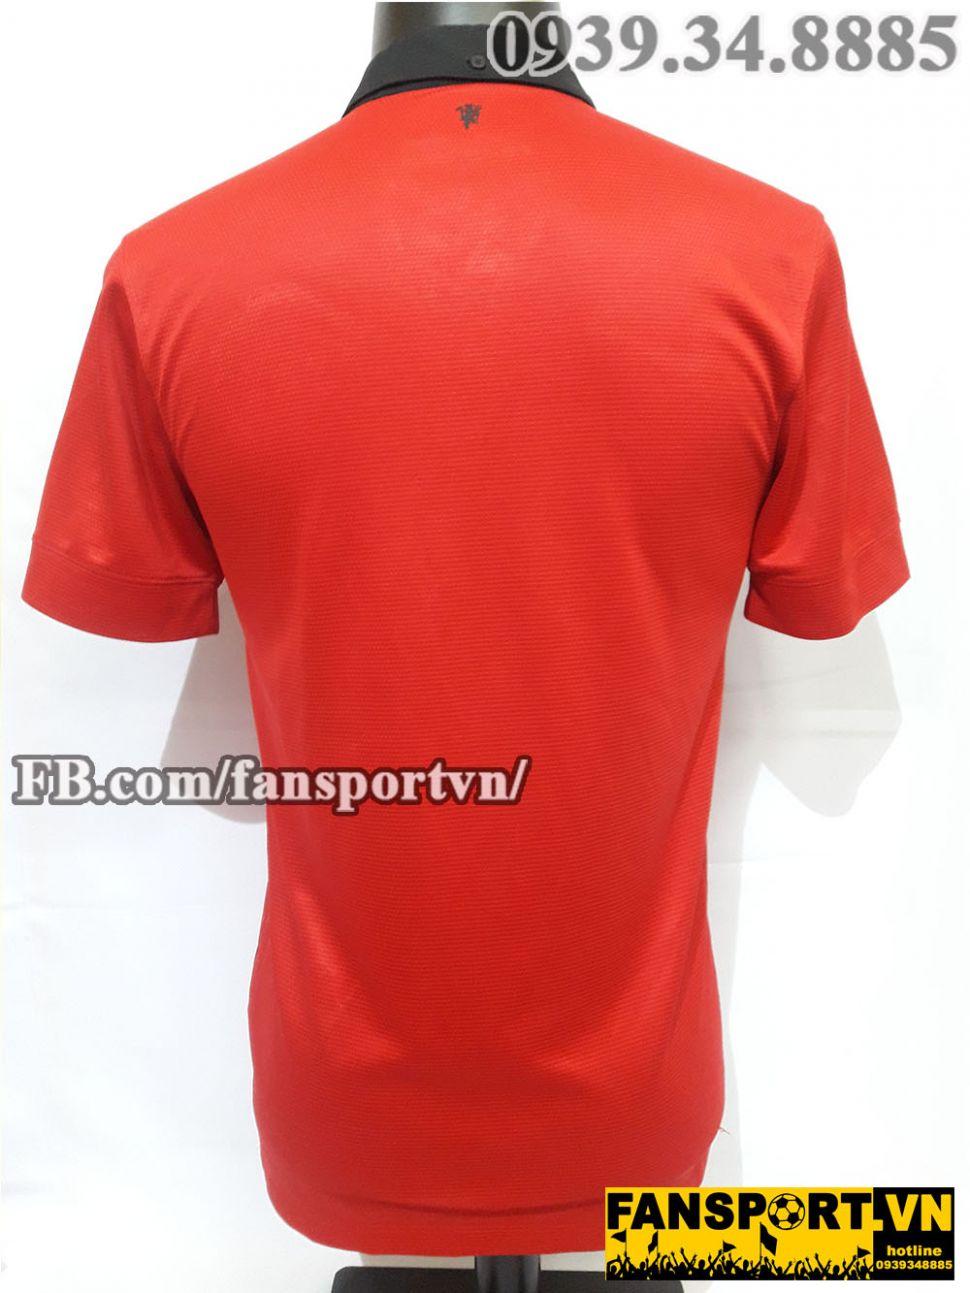 774662d1f8f Polo Shirt Manchester United 2013 - DREAMWORKS